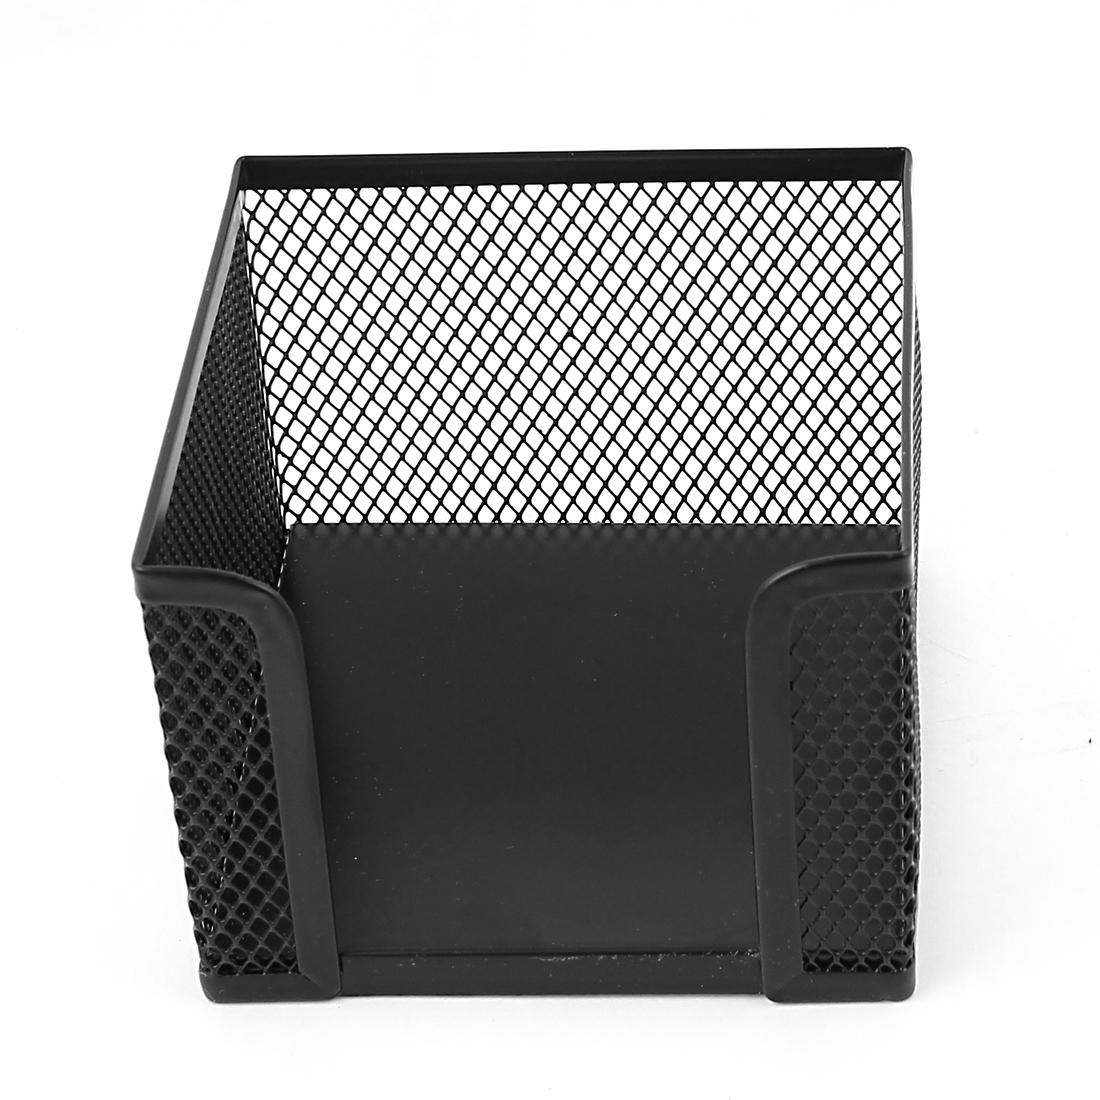 Office Space Desktop Decor Black Metal Mesh Design Pen Pencil Holder Desk Container